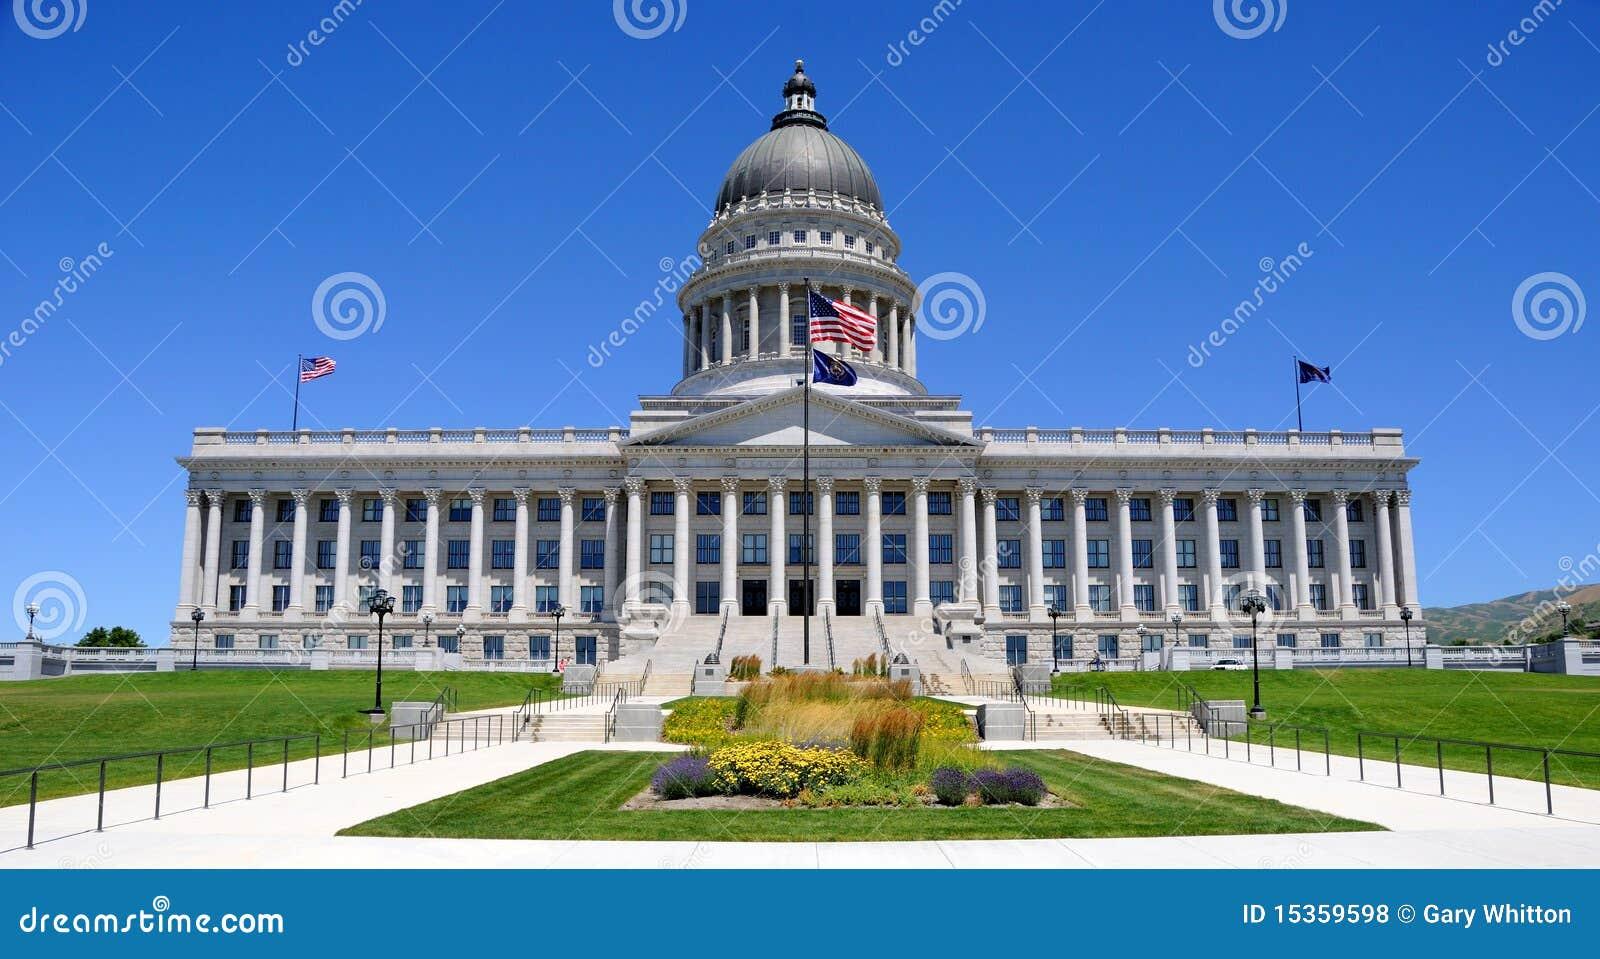 Utah State Capitol Building Royalty Free Stock s Image